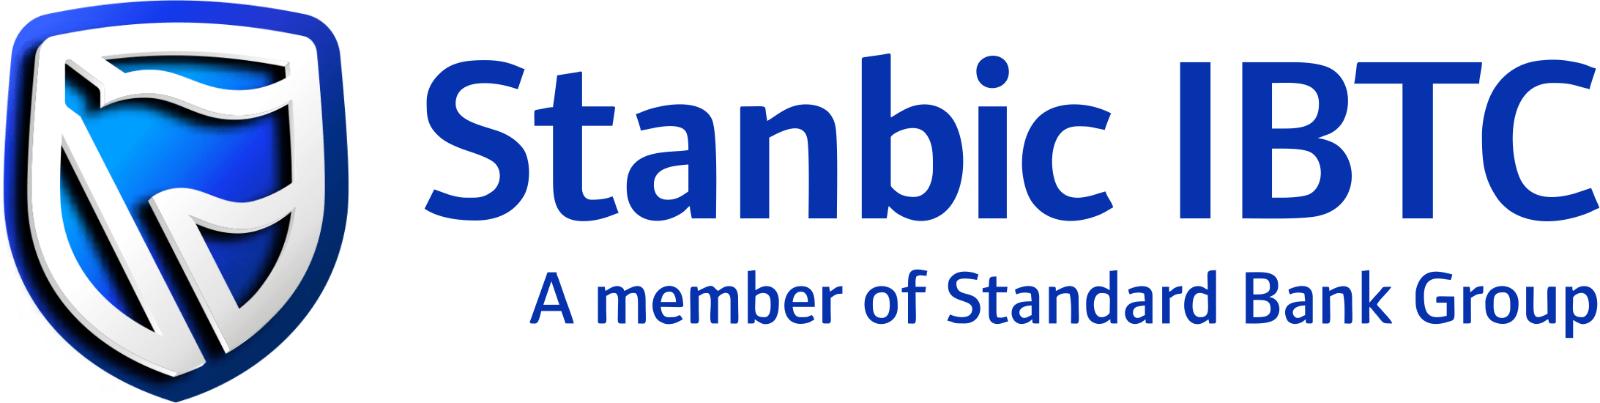 Stanbic-ibtc-logo.png